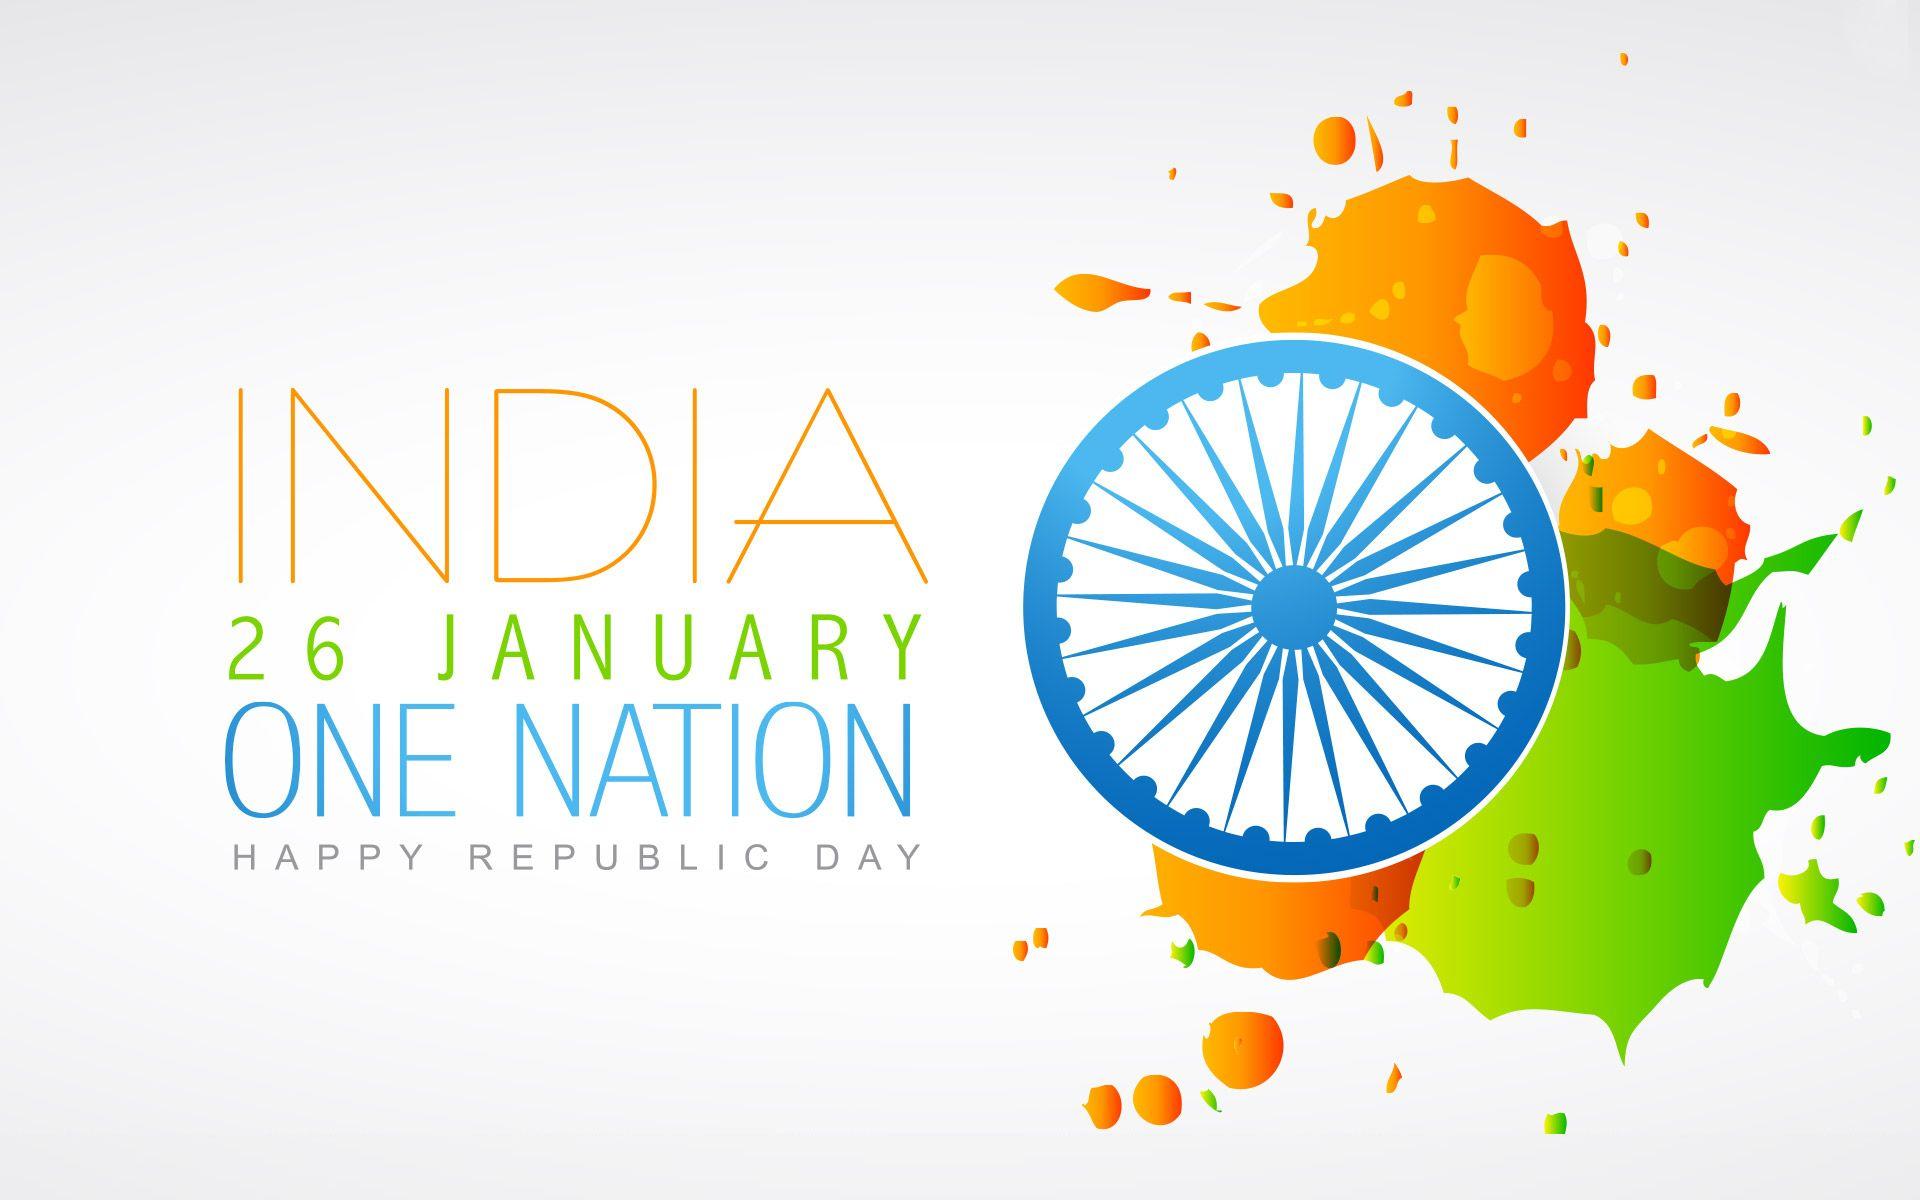 Happy Republic Day HD Wallpaper For Whatsapp Day26 JanuaryHD